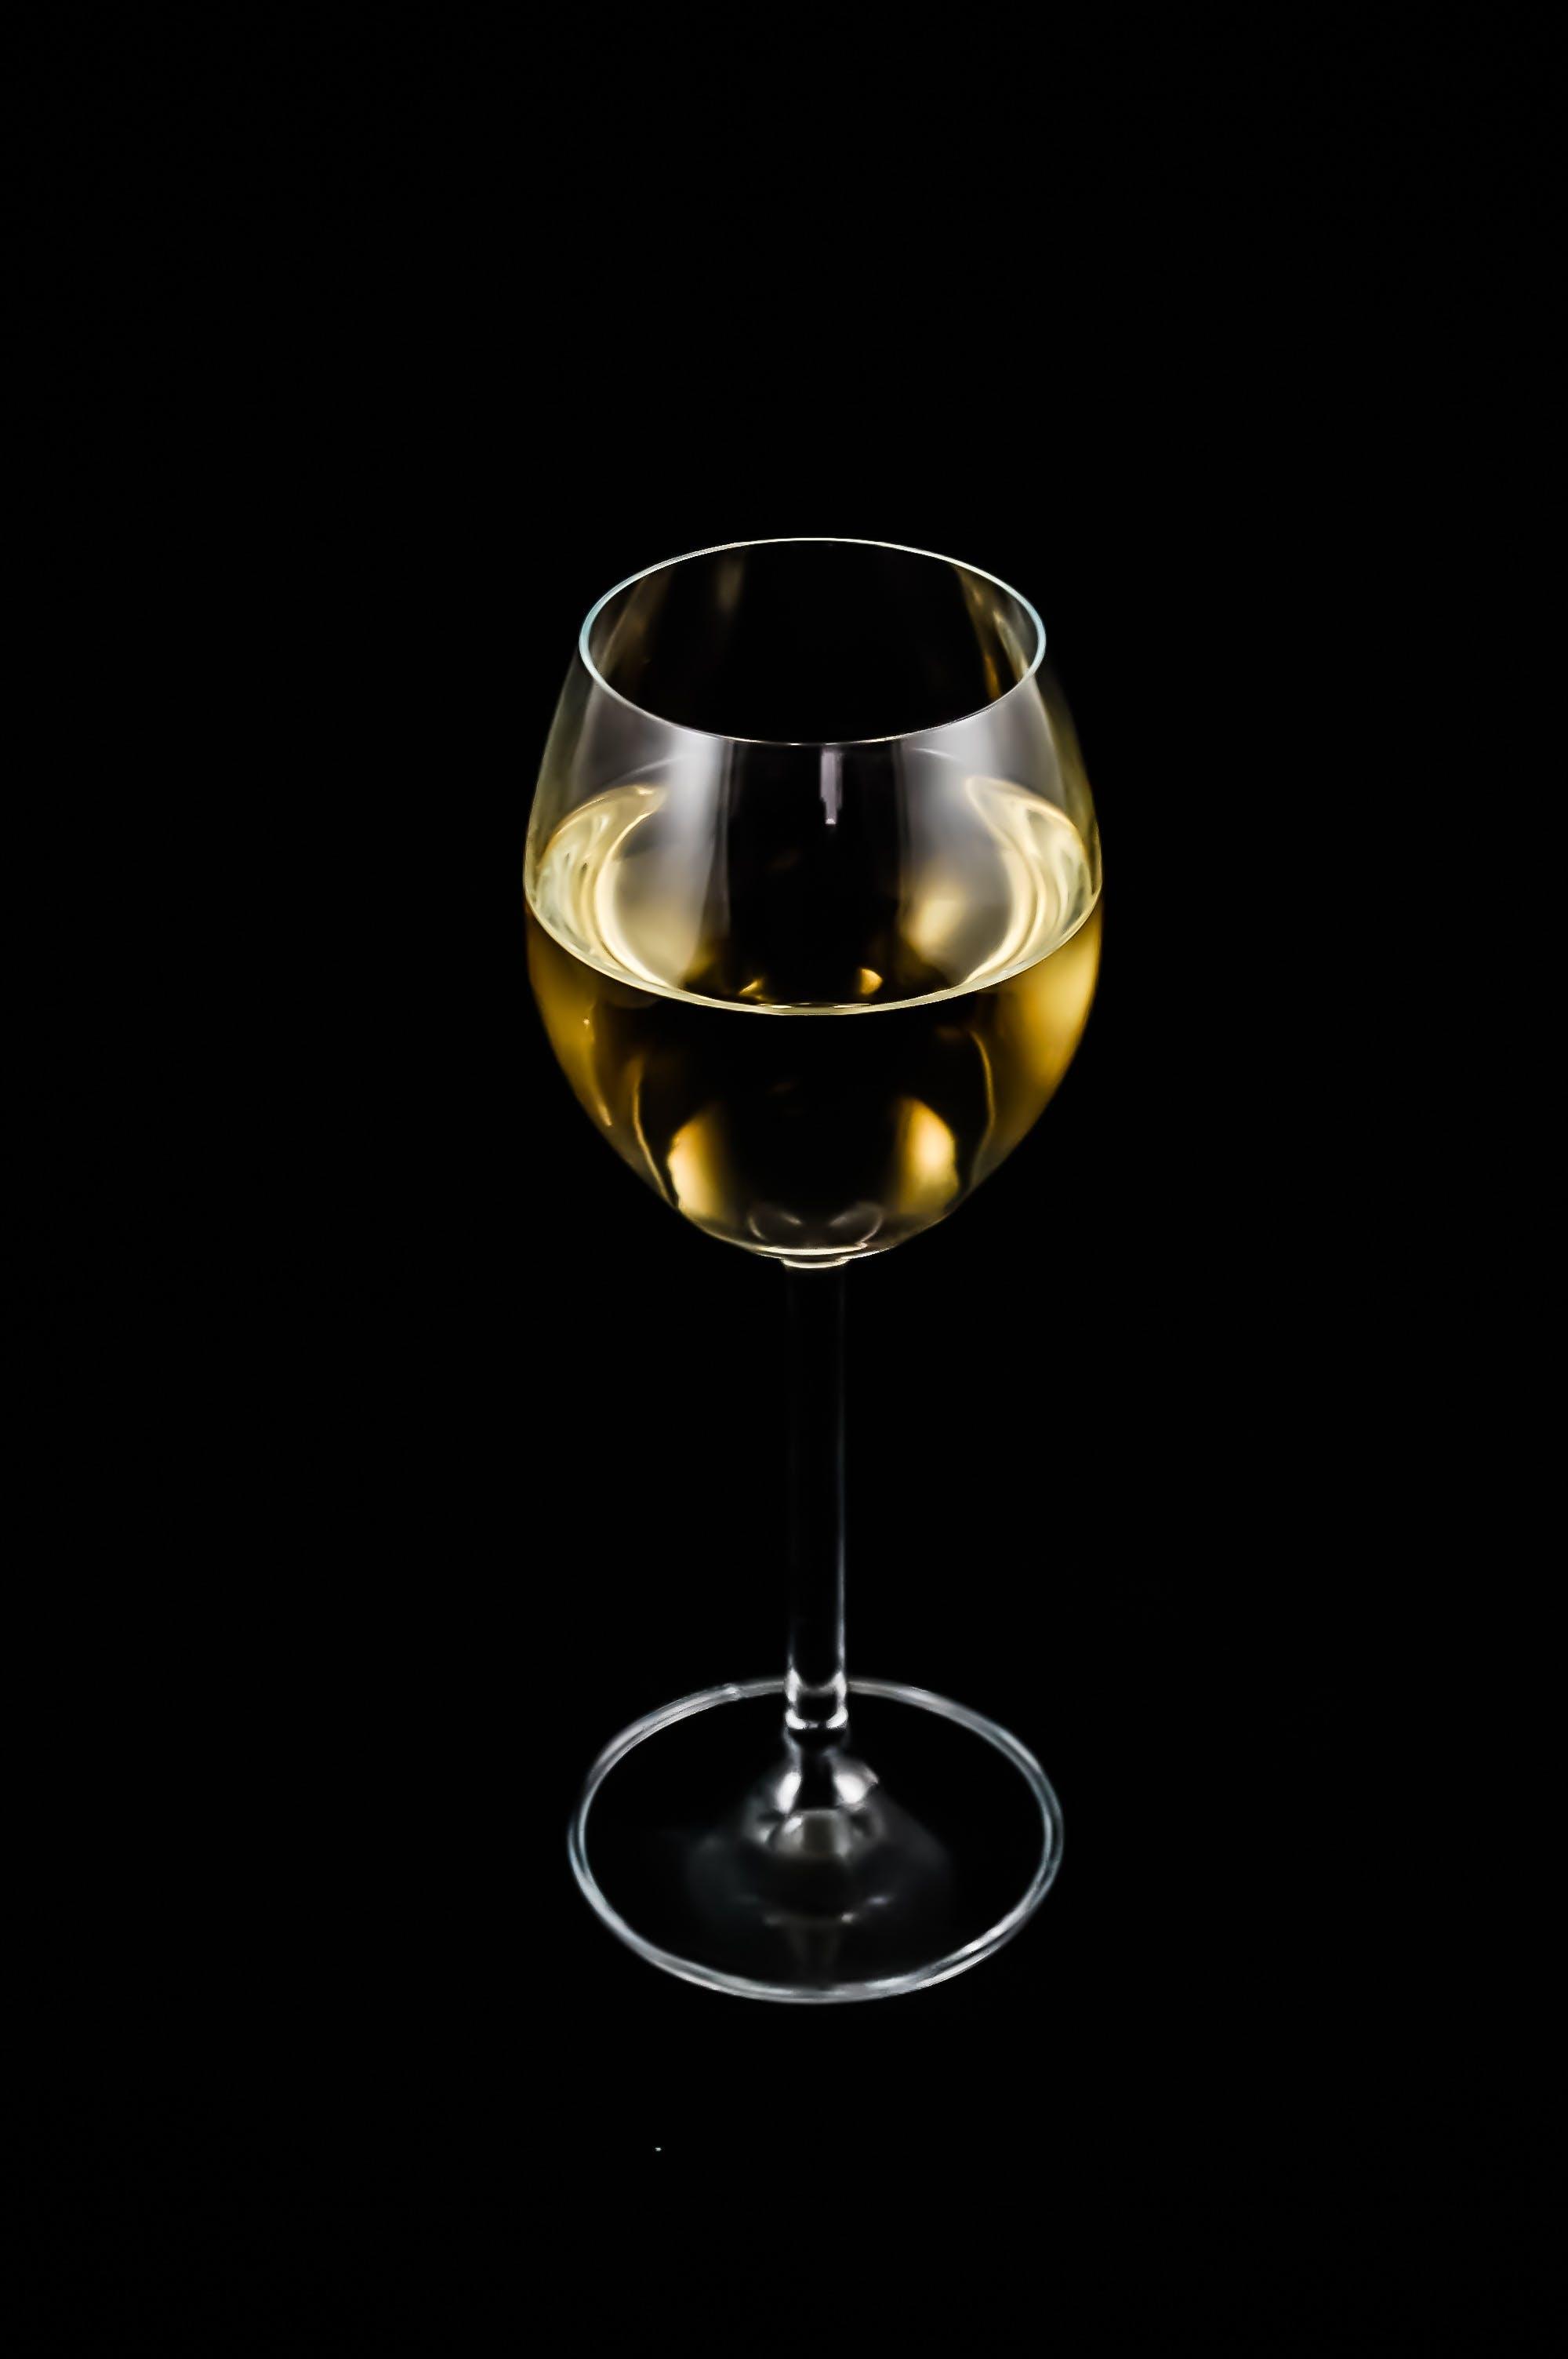 Kostnadsfri bild av alkohol, glas, vin, vitt vin